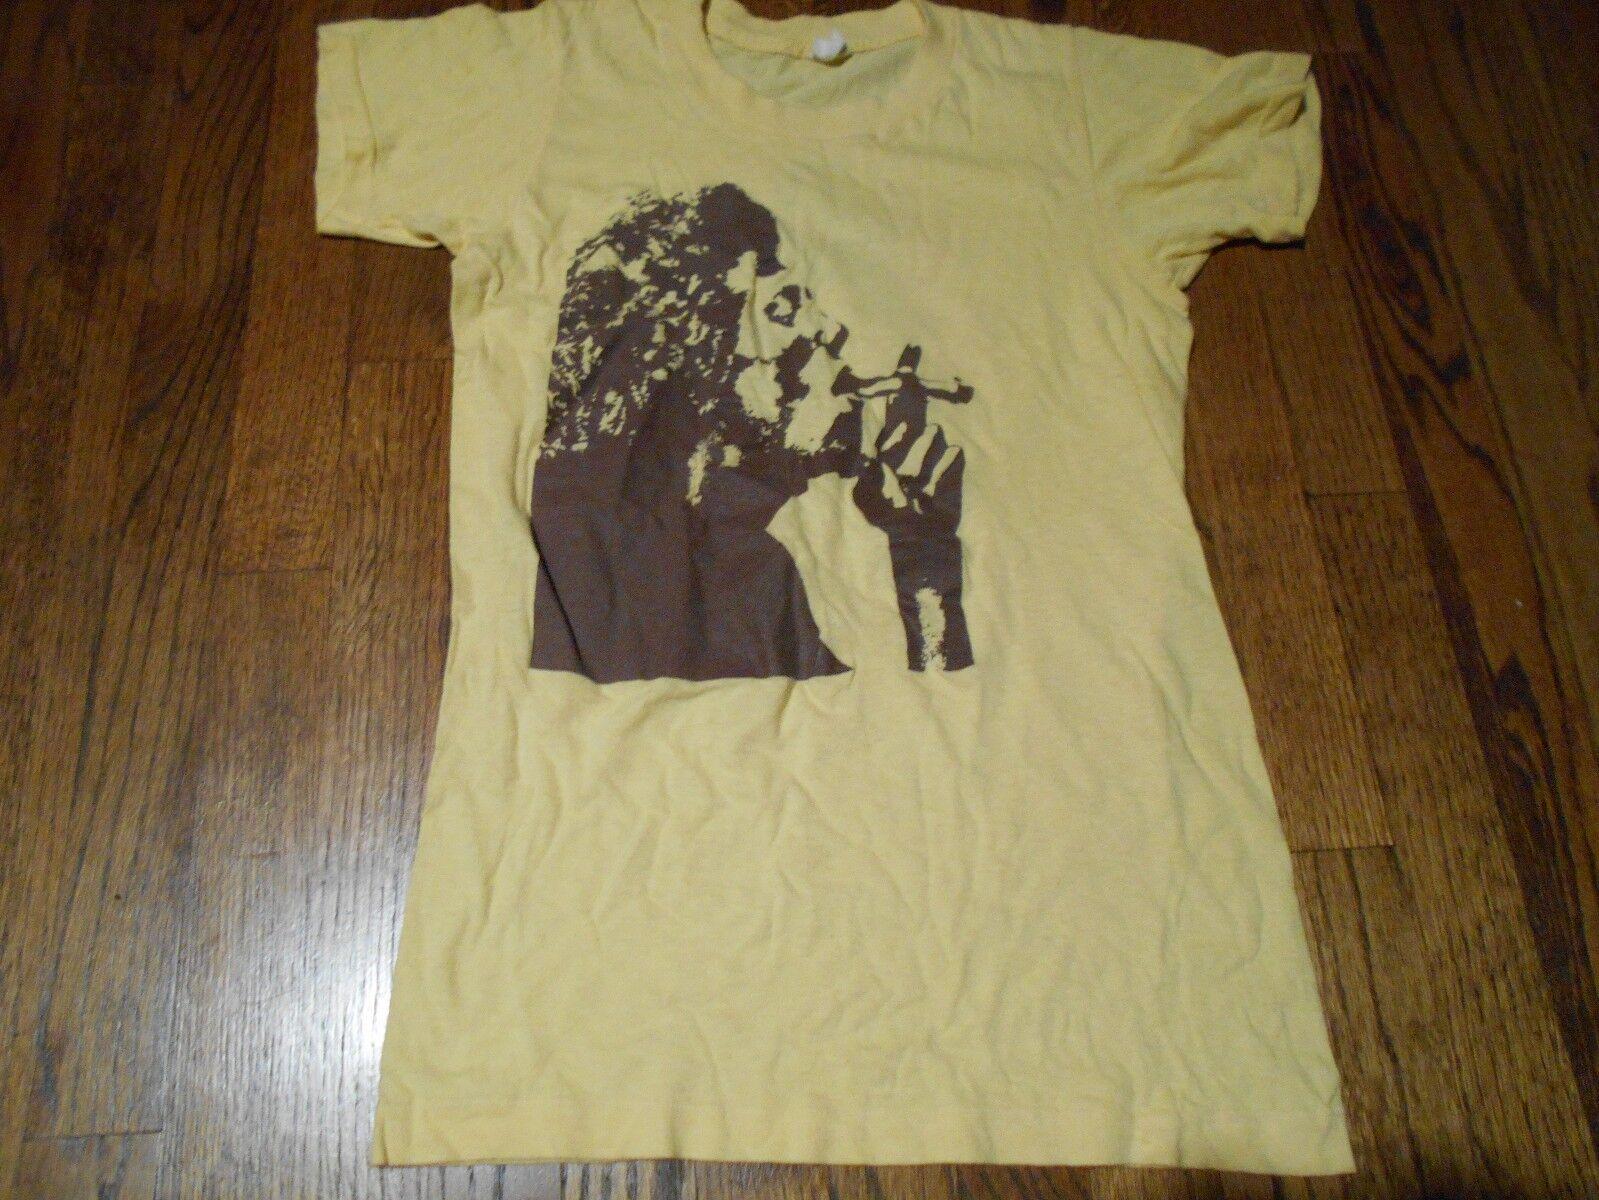 ORIGINAL VINTAGE BULLDOG T Shirt 70'S cannabis AMSTERDAM PSYCHEDELIC HEMP cannabis 70'S WEED 70cad1